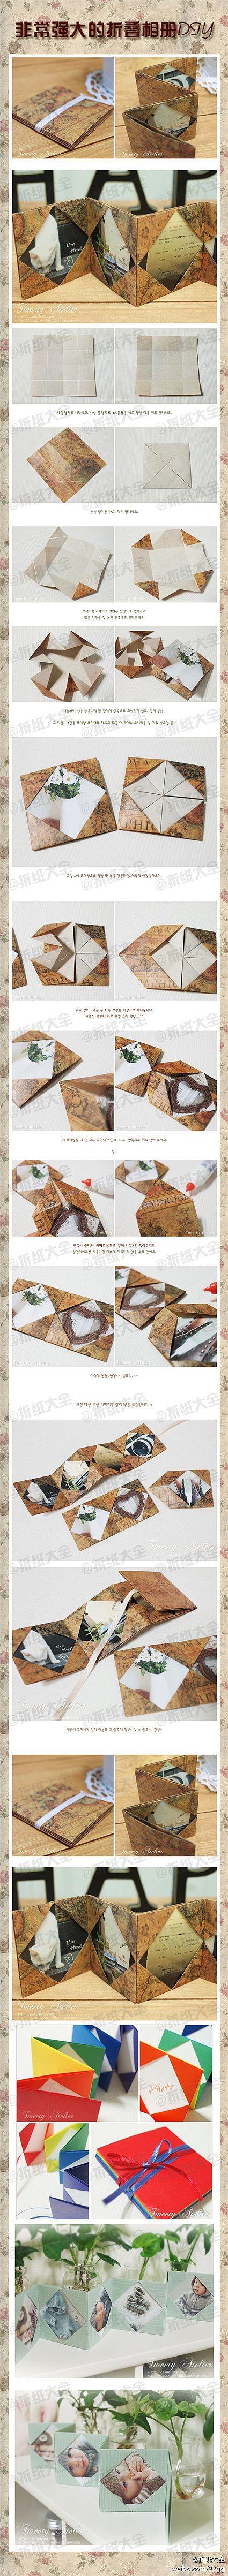 Book DIY] retro feel of the full folding album! ! ! - Original: - the original address: